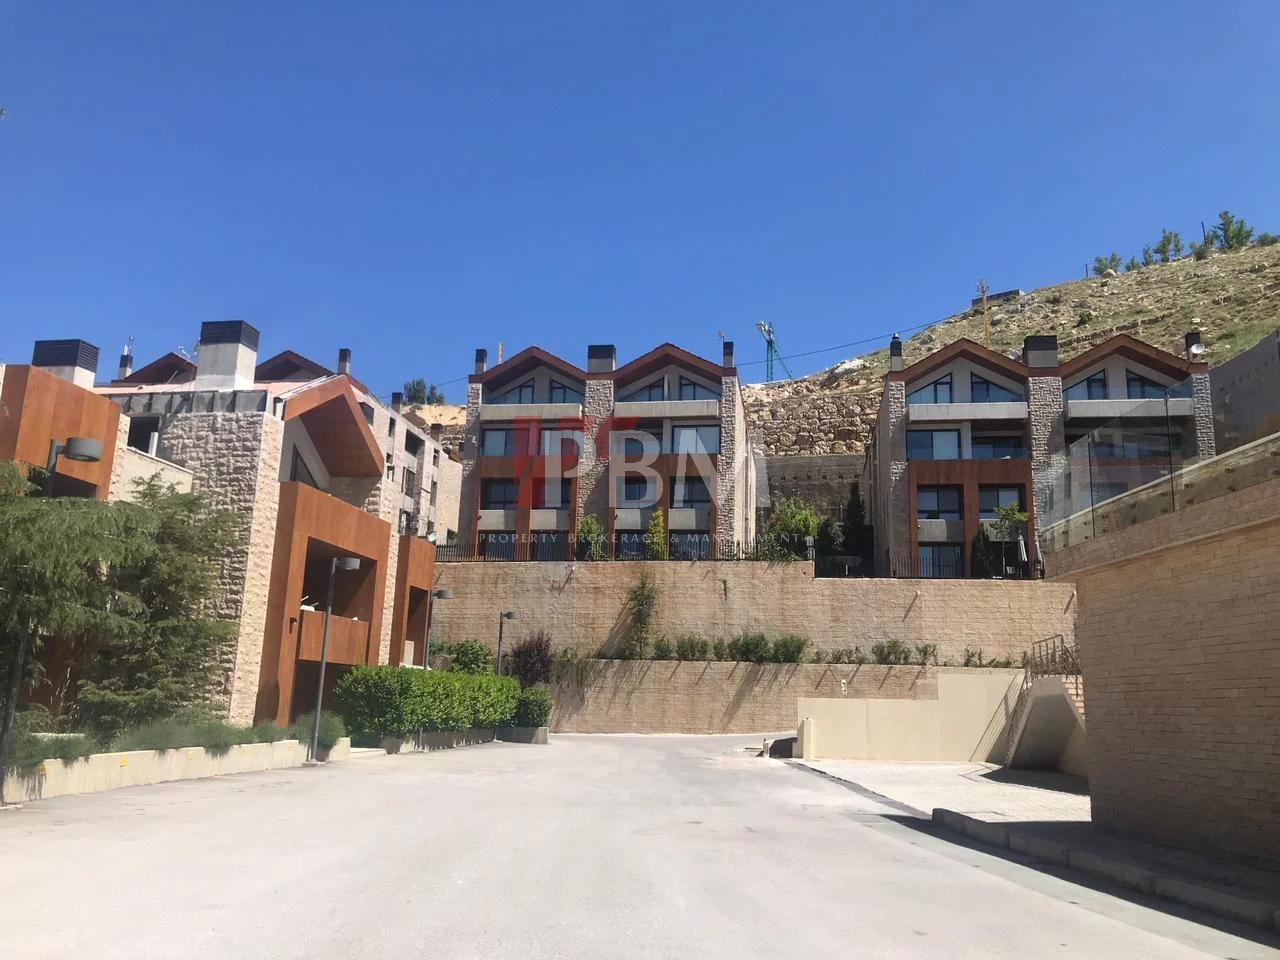 Location Chalet Faqra